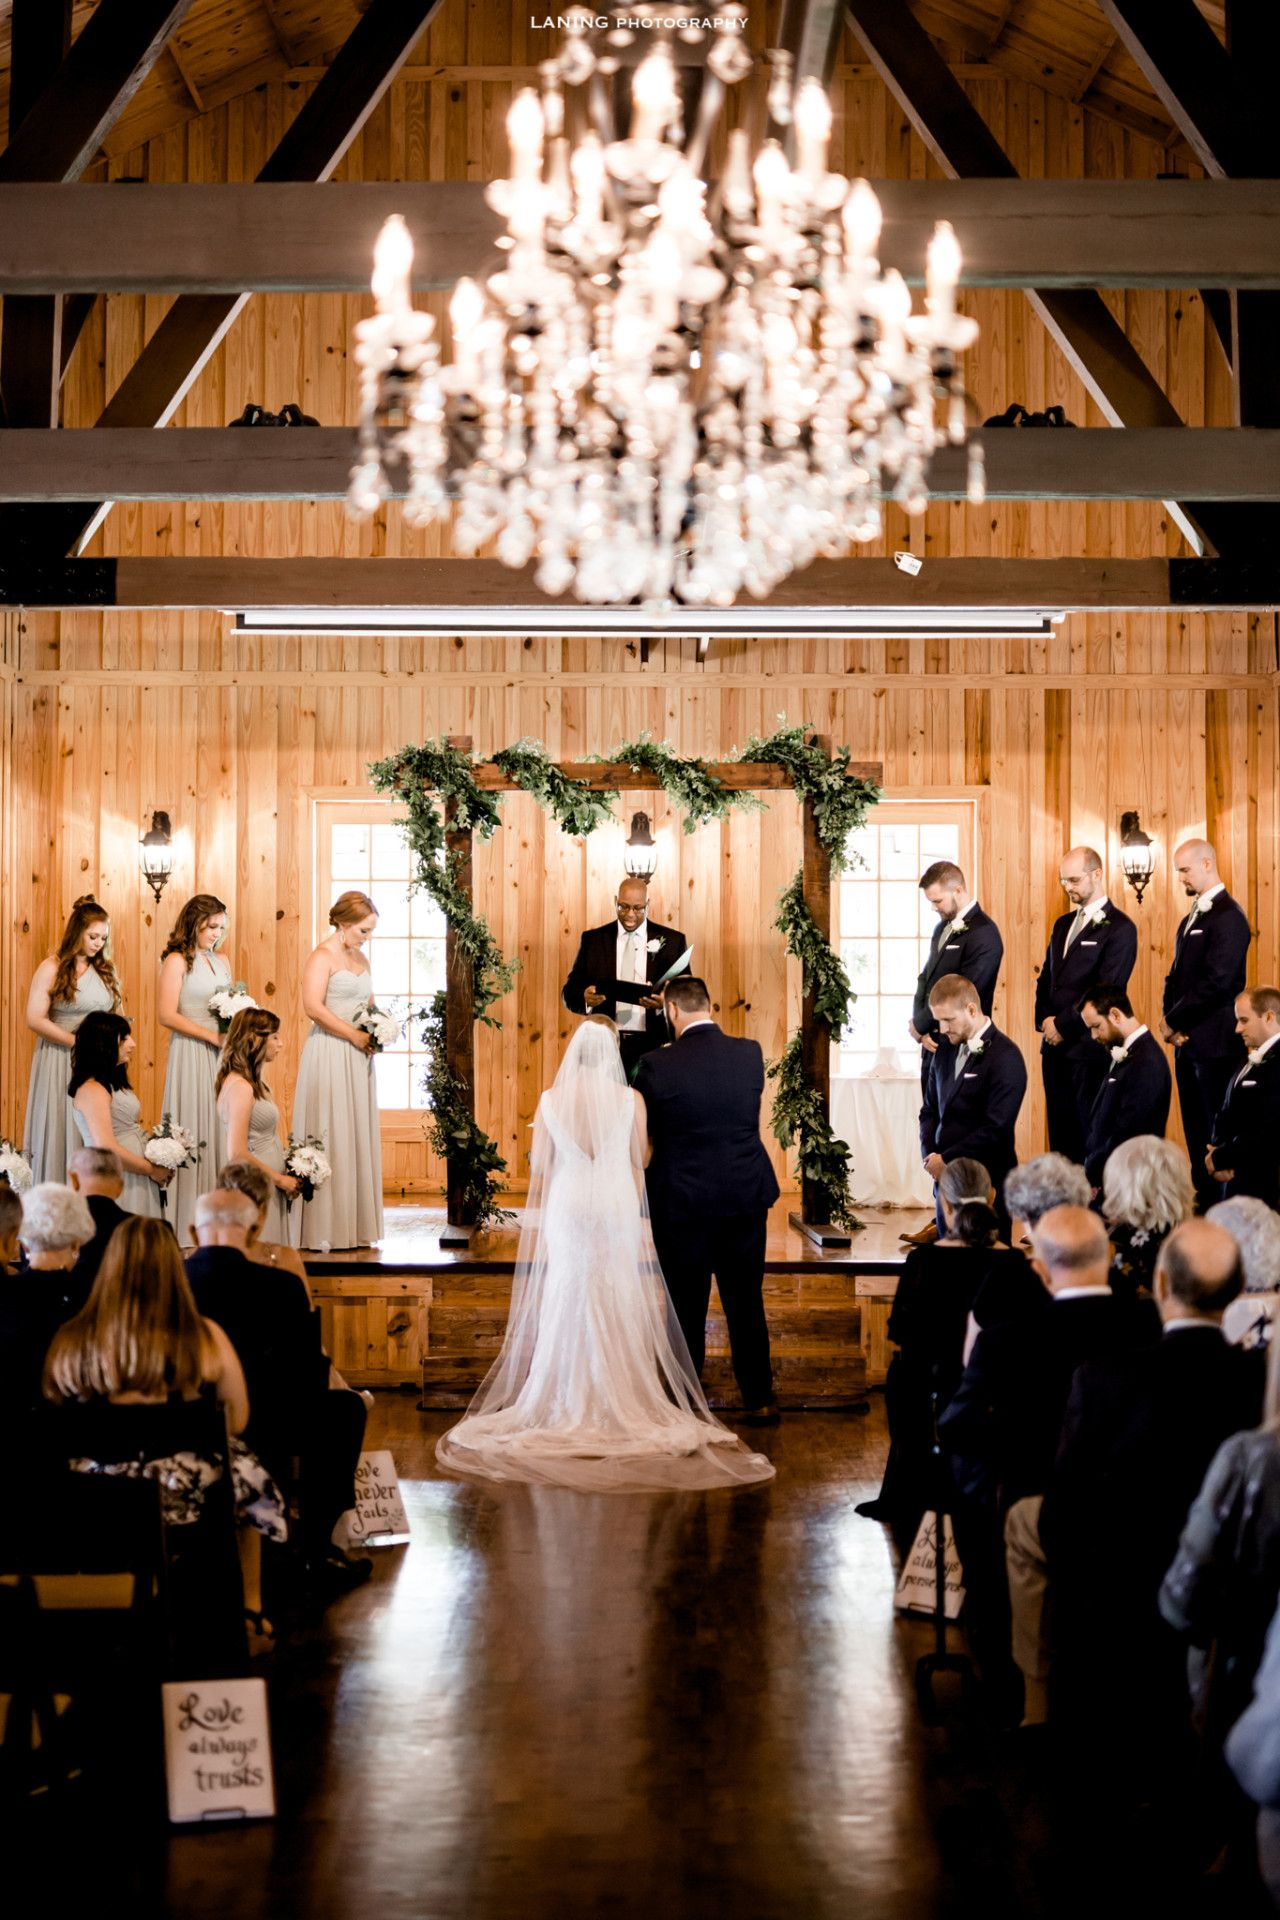 The Ranch style wedding venue in Denton | Ranch style ...